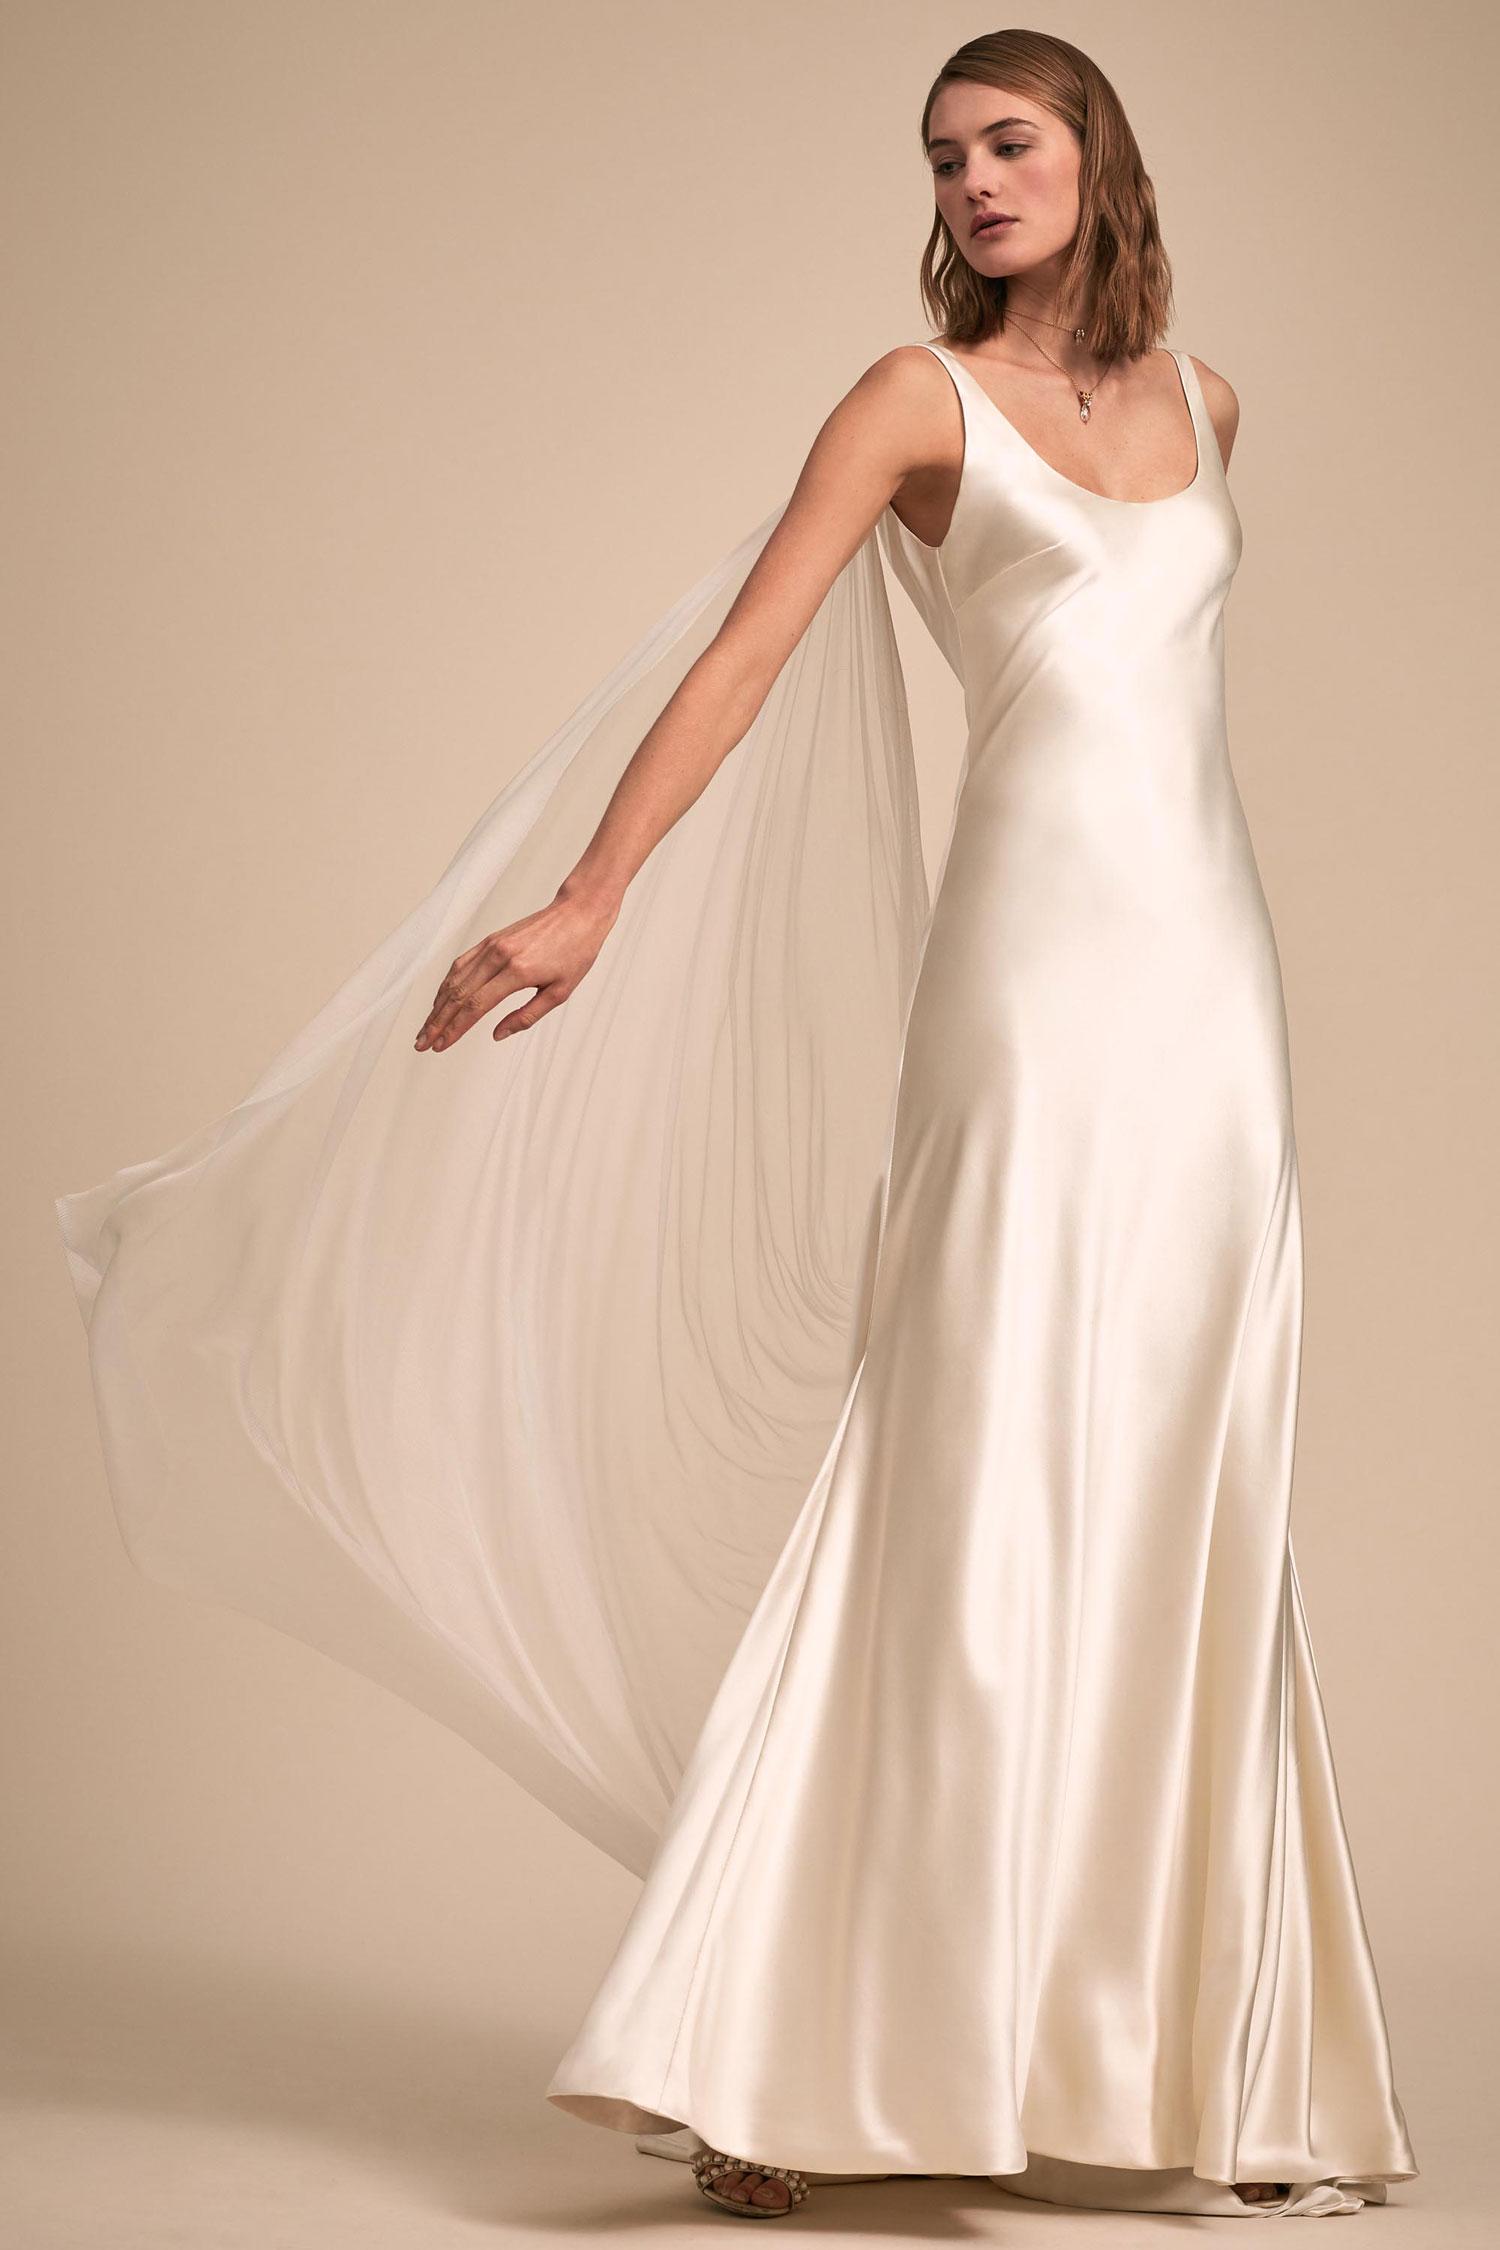 BHLDN The Designer Collective Kerry by Johanna Johnson silk wedding dress scoop neck